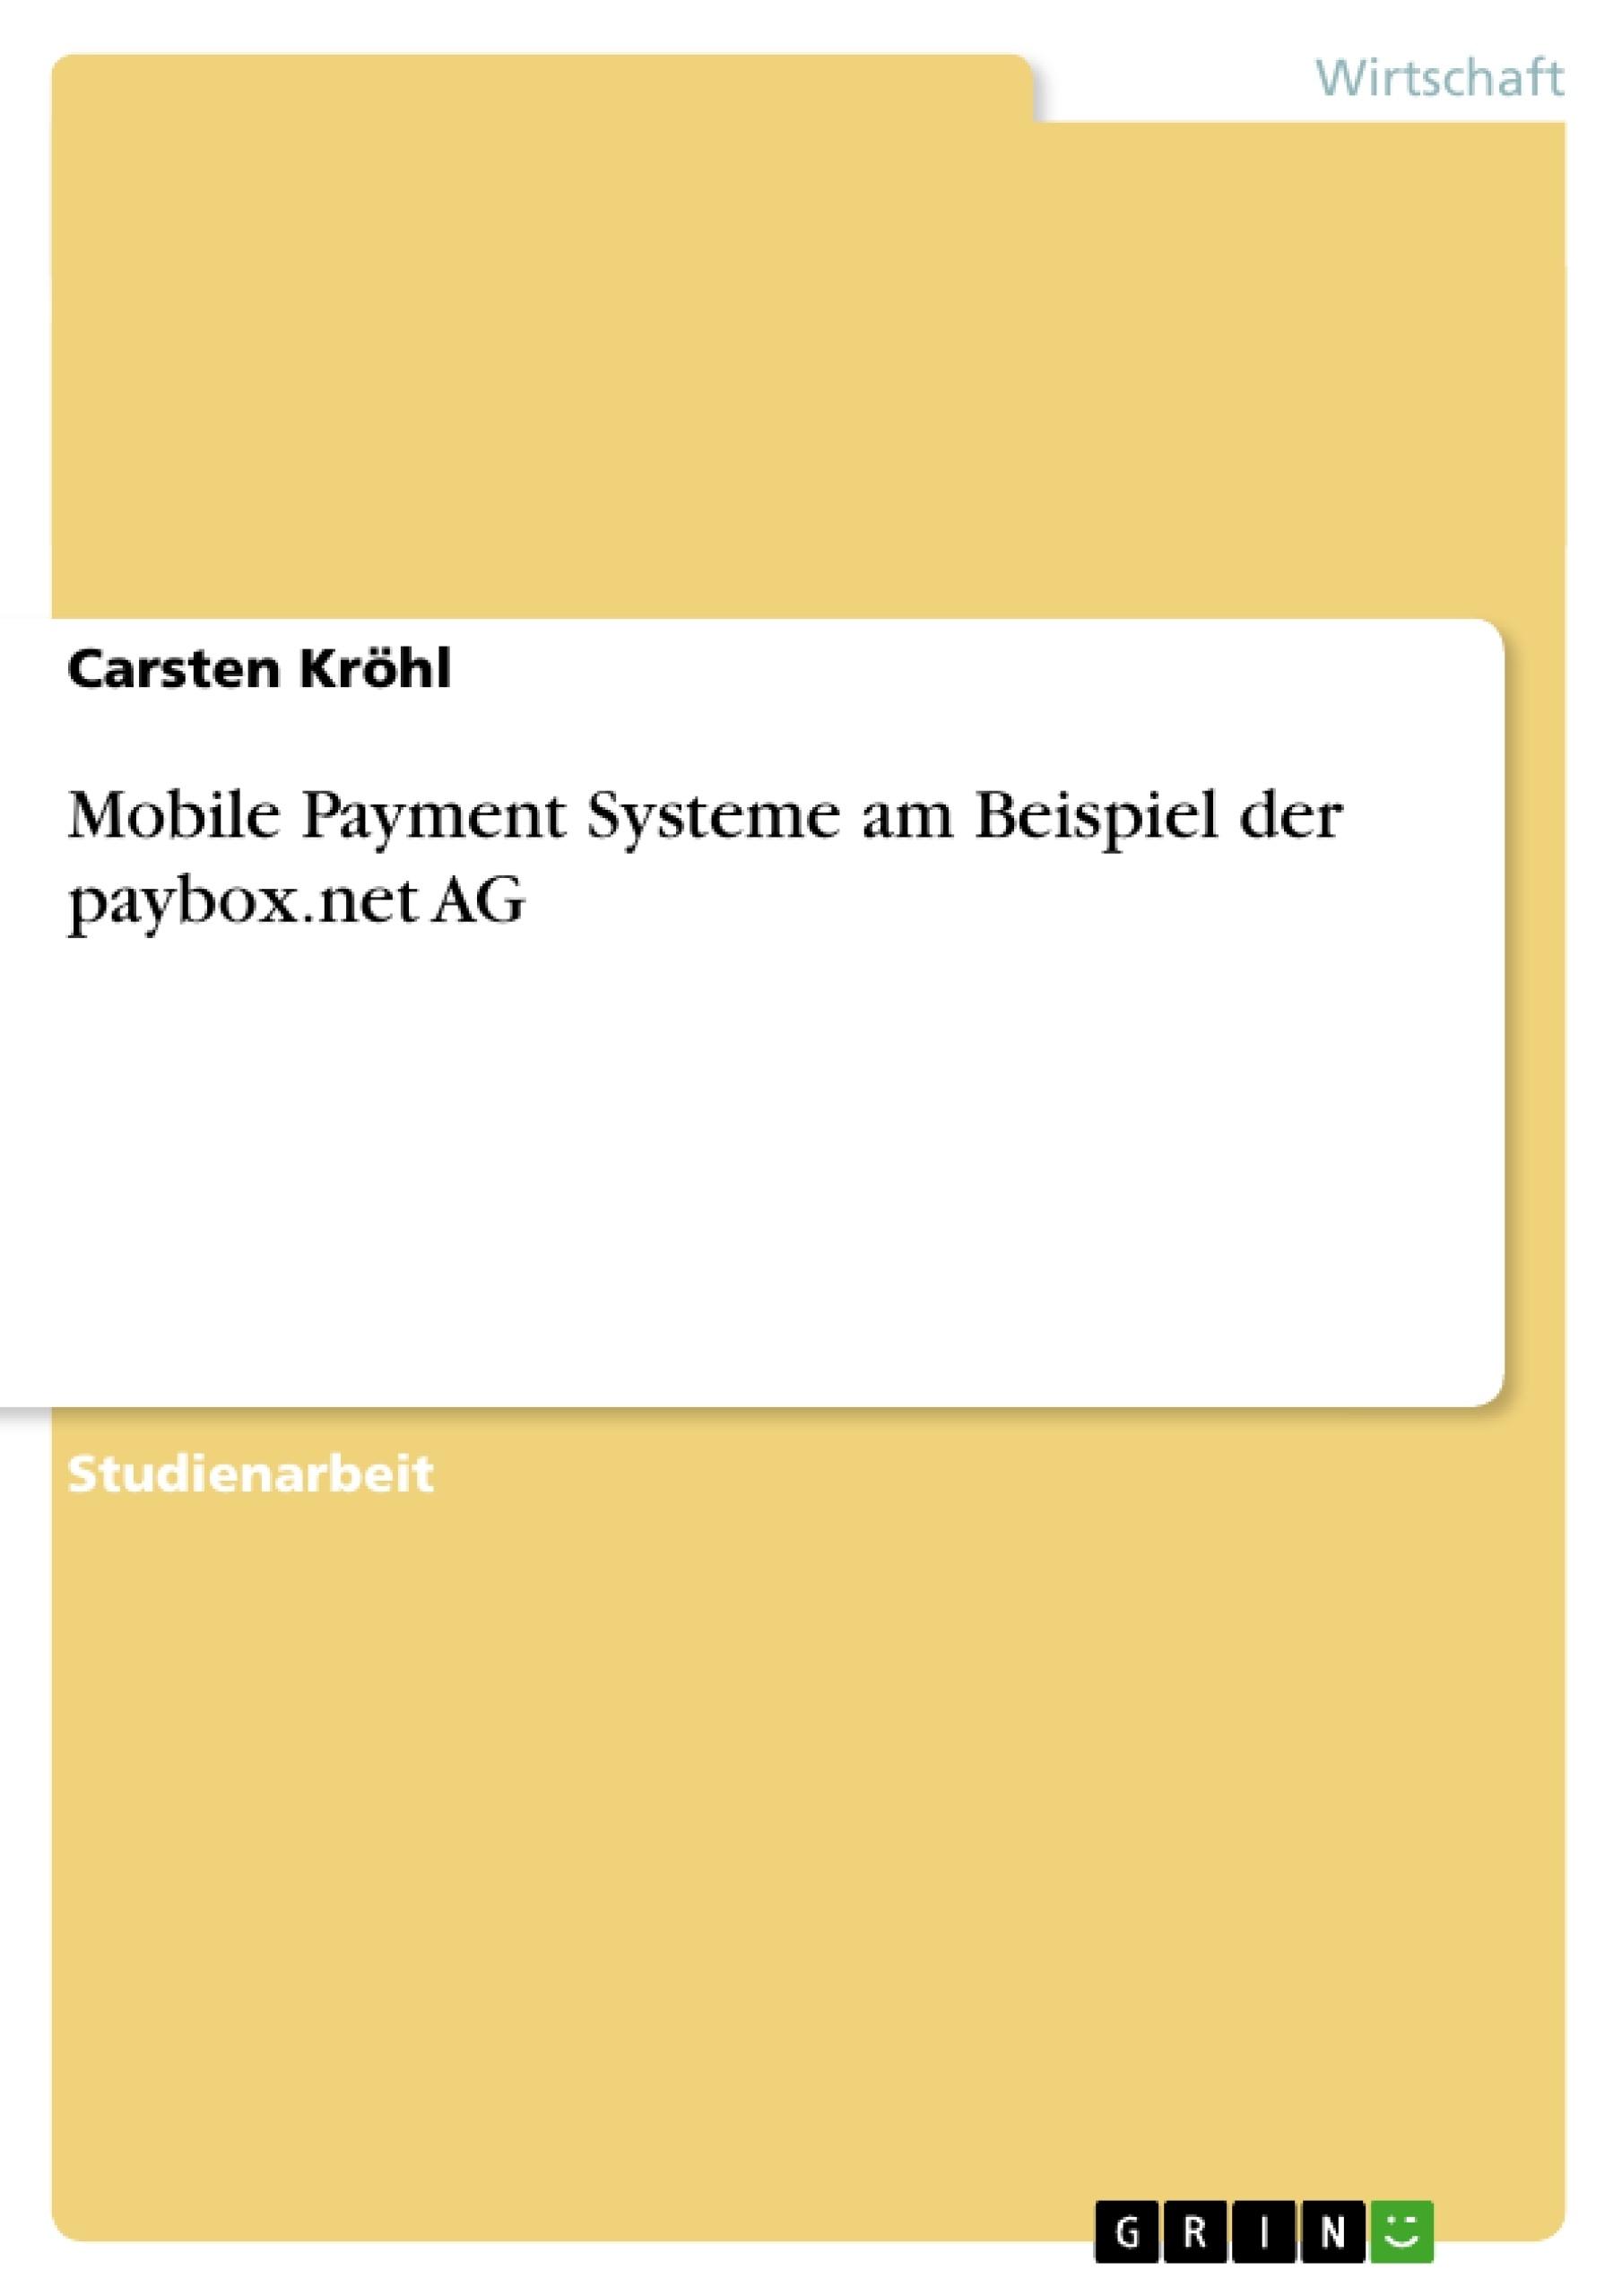 Titel: Mobile Payment Systeme am Beispiel der paybox.net AG